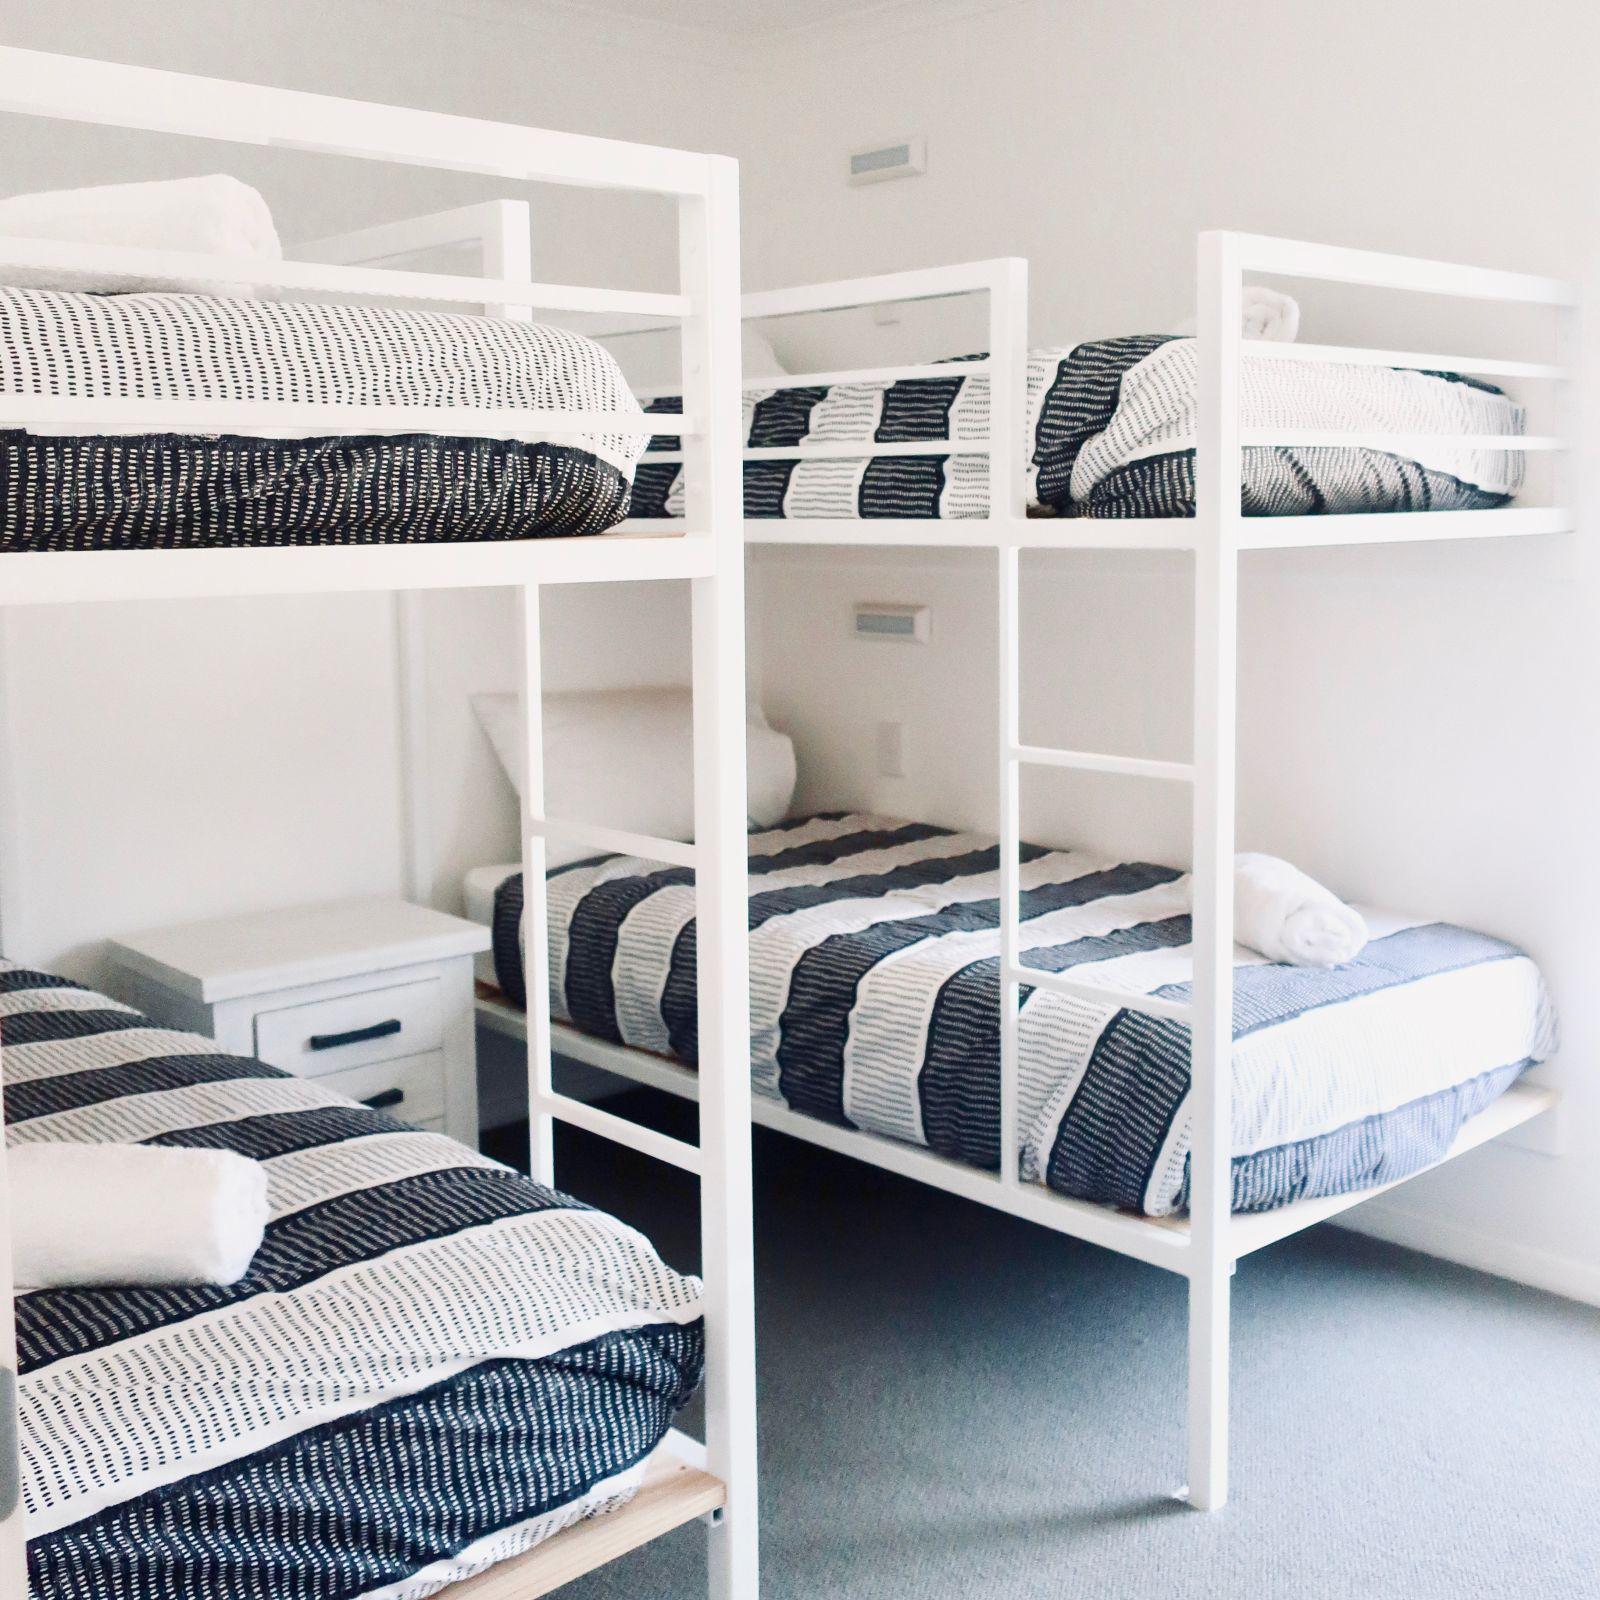 Beachcomber Cabin double bunkbeds